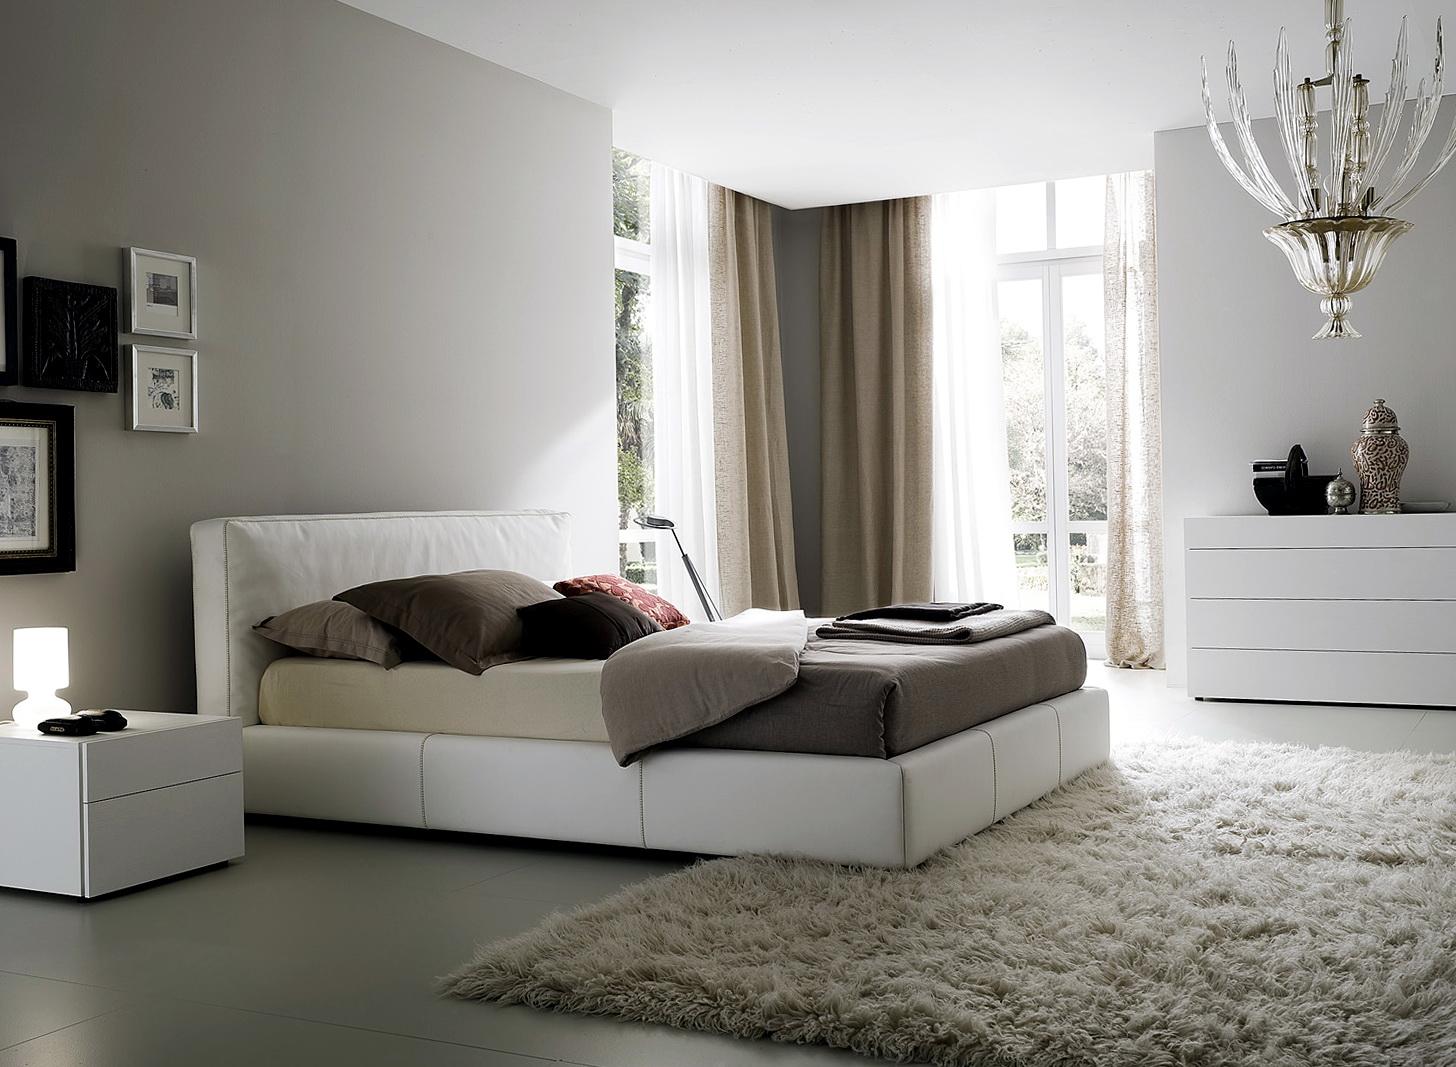 Simple Bedroom Ideas For Women